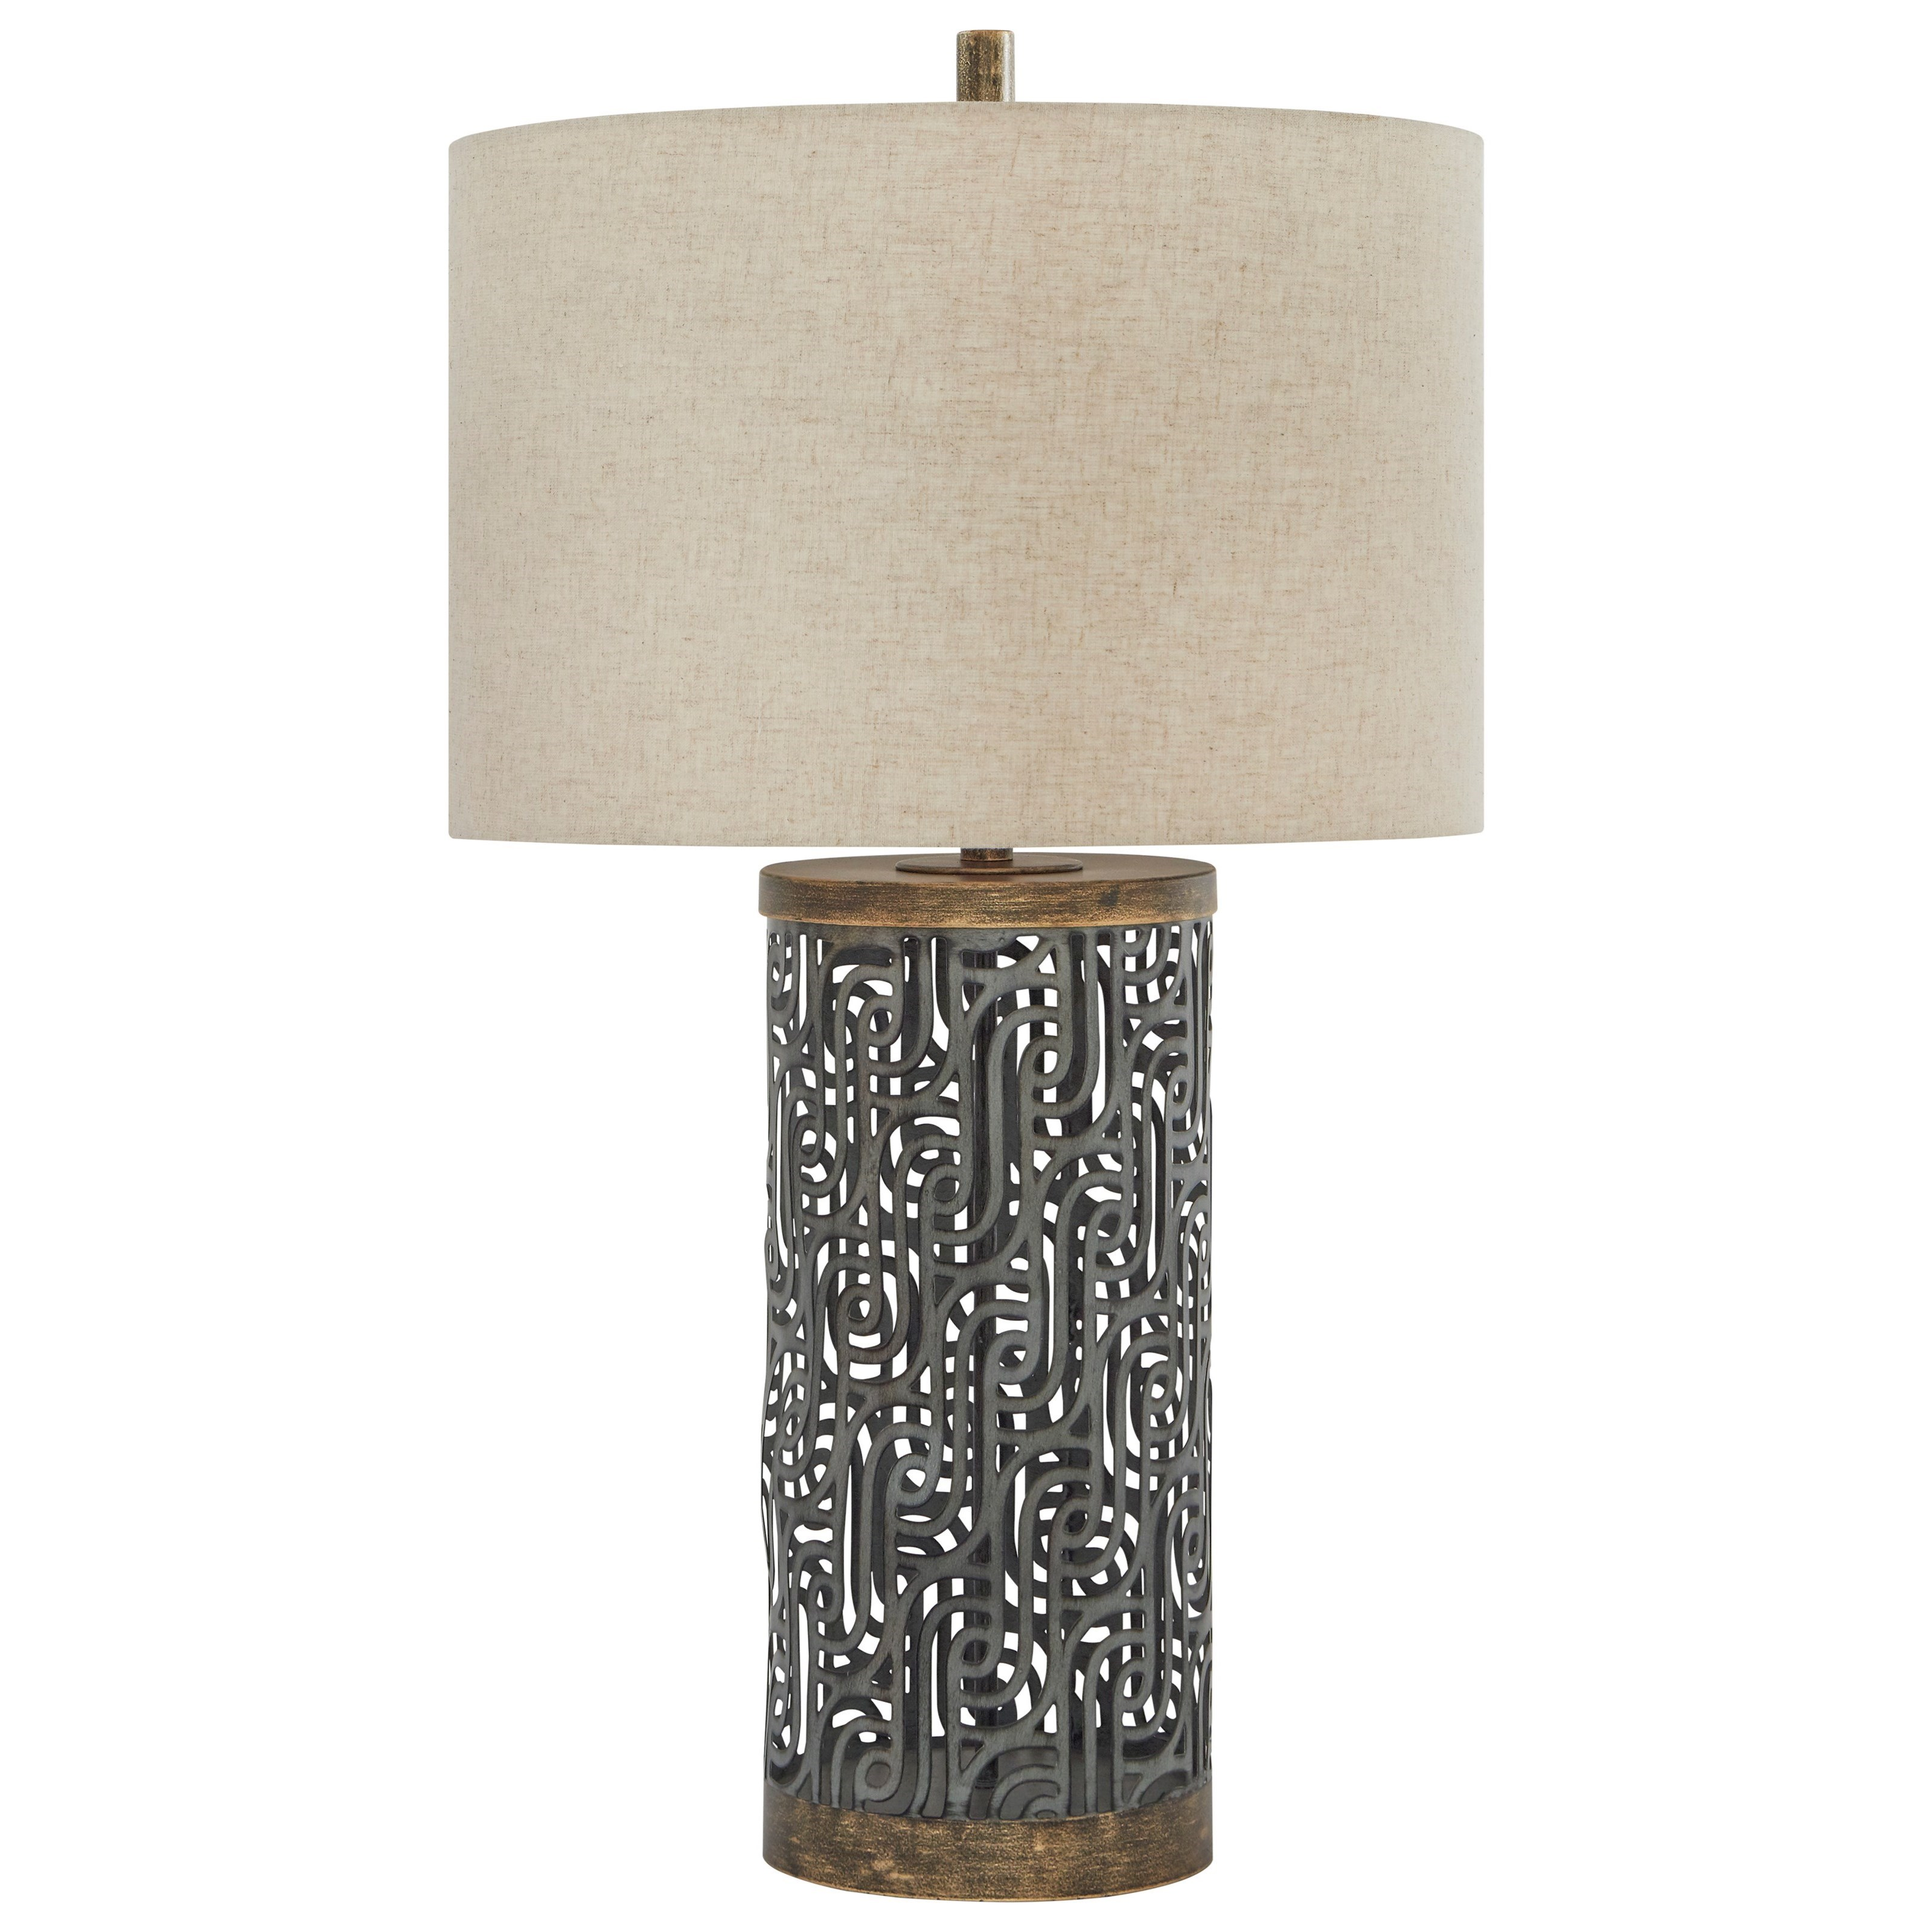 Dayo Gray/Gold Metal Table Lamp